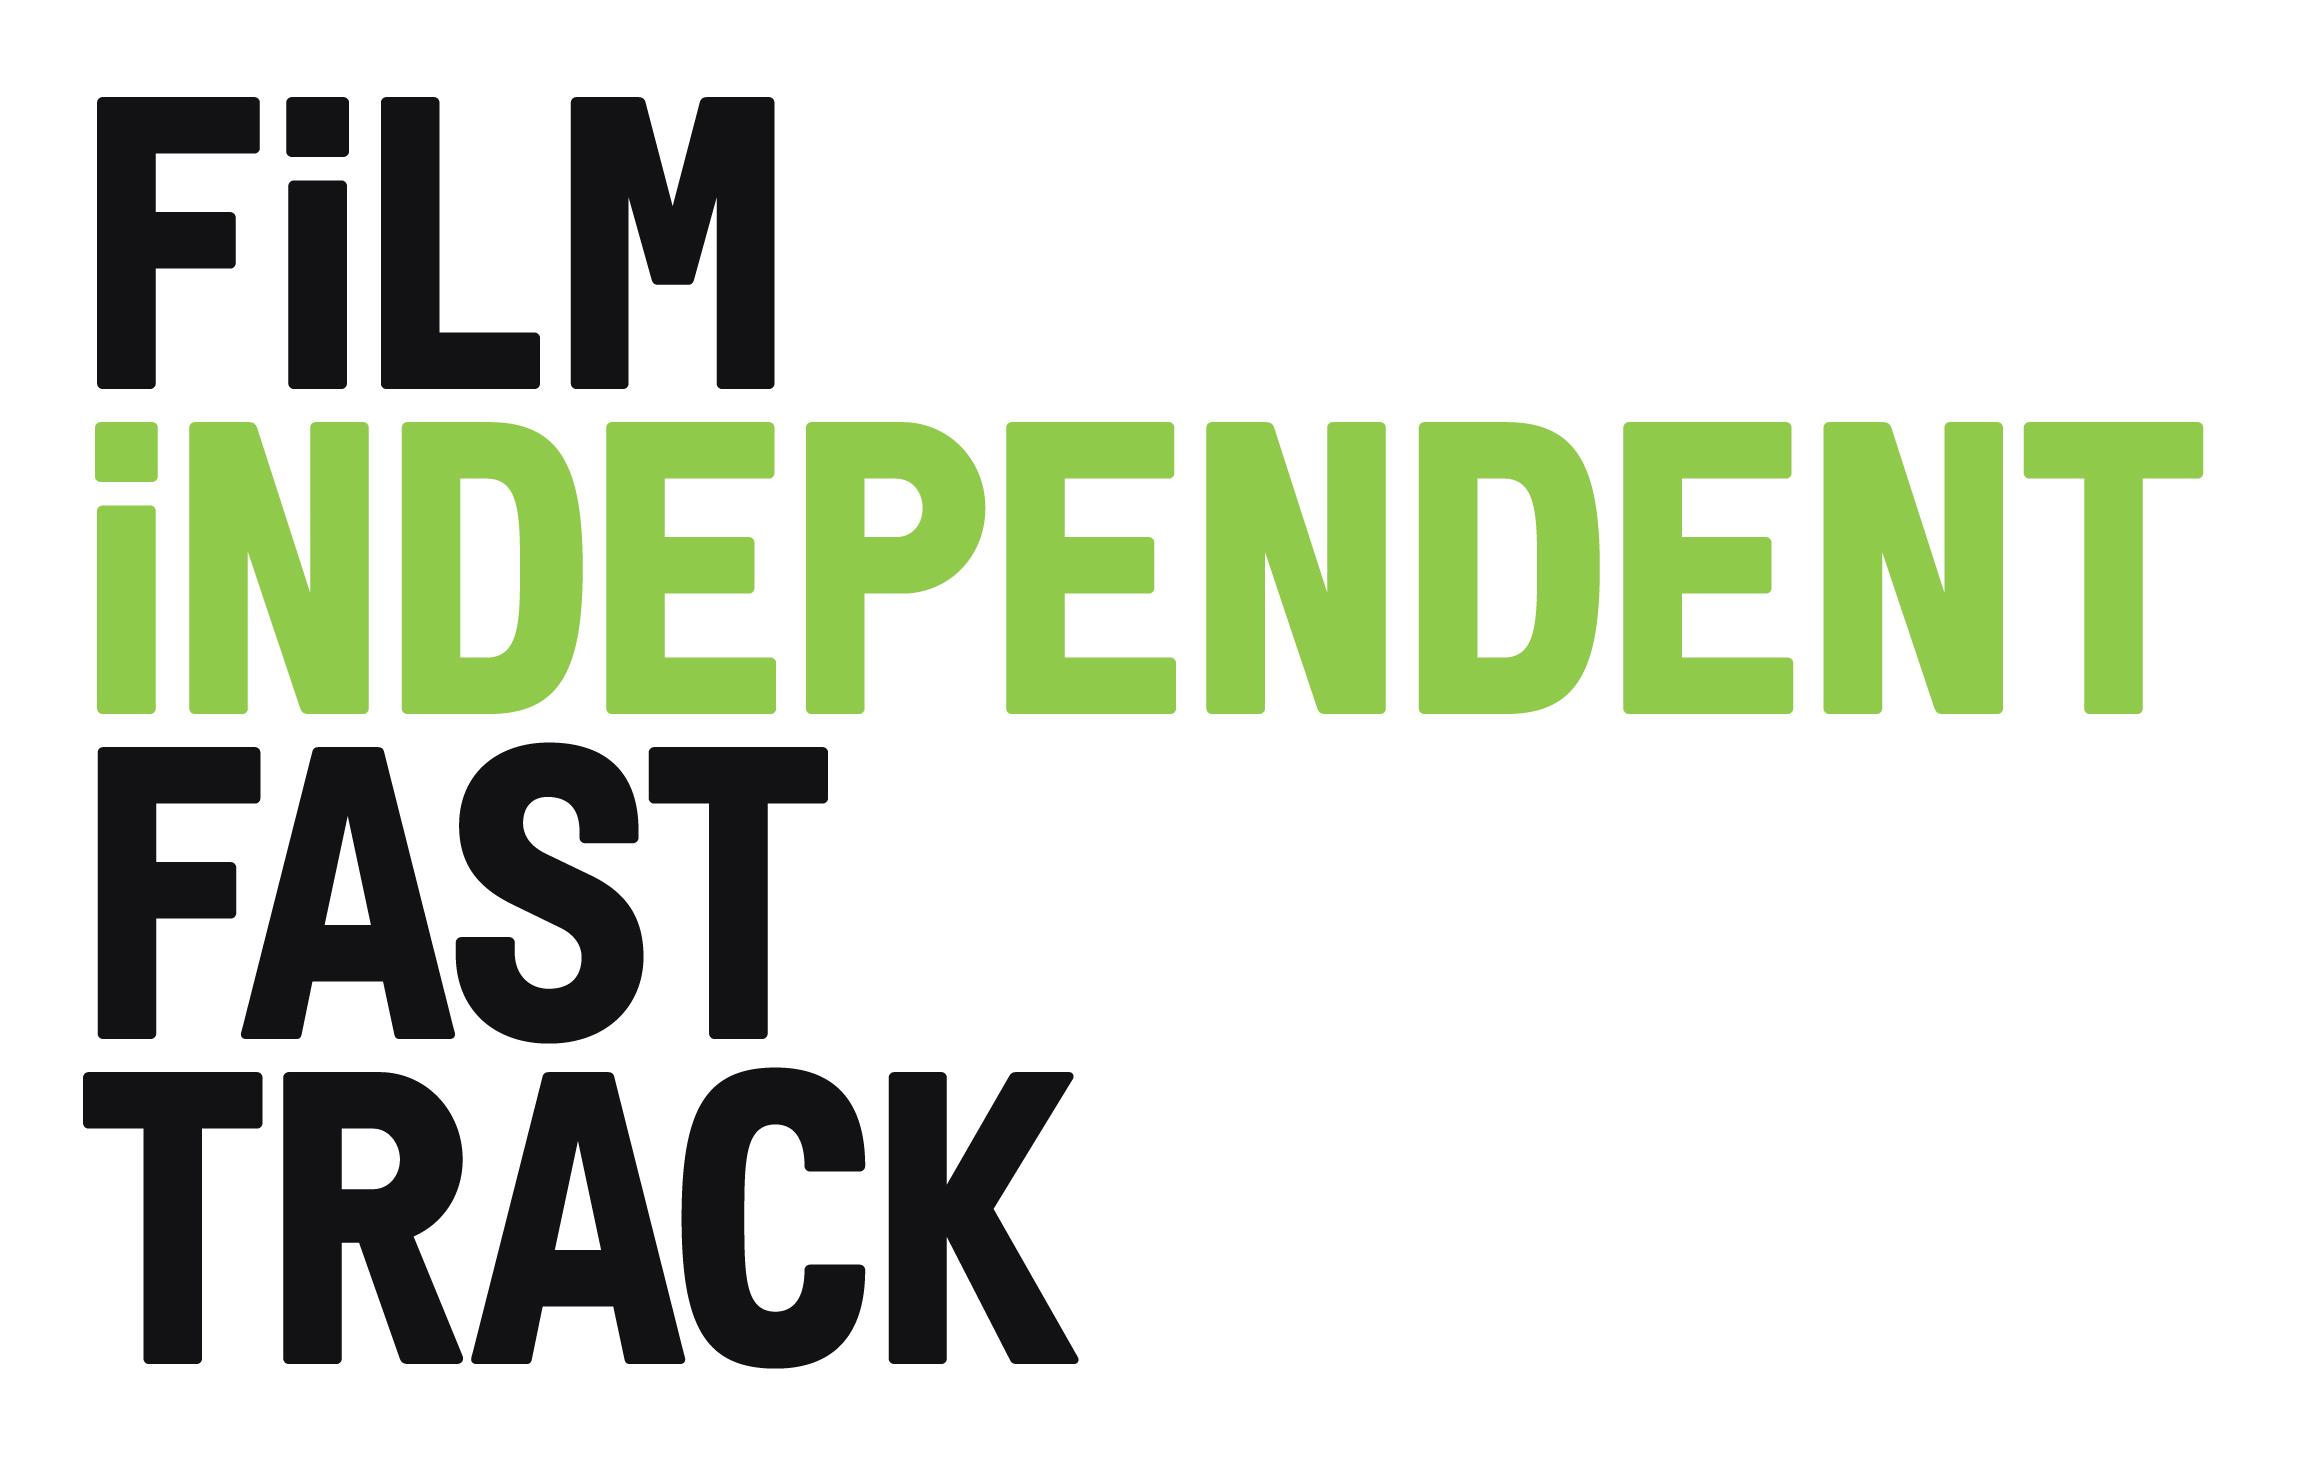 Fi_FastTrack_Secondary_Logo_RGB_POS_1_.jpg